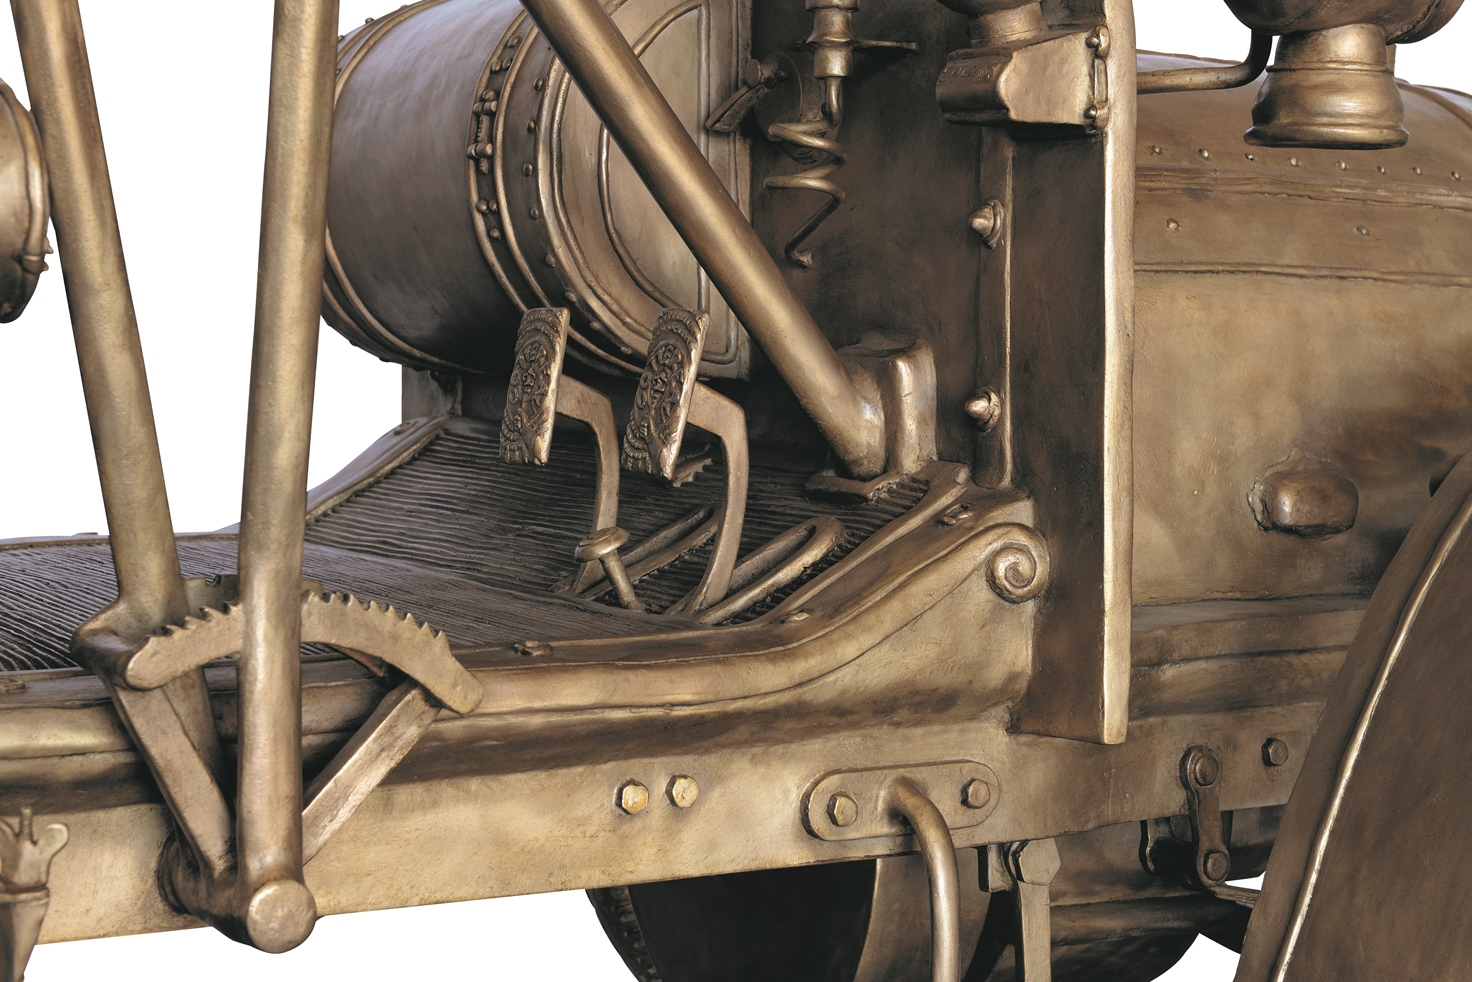 vintage car detail1 (2) sm